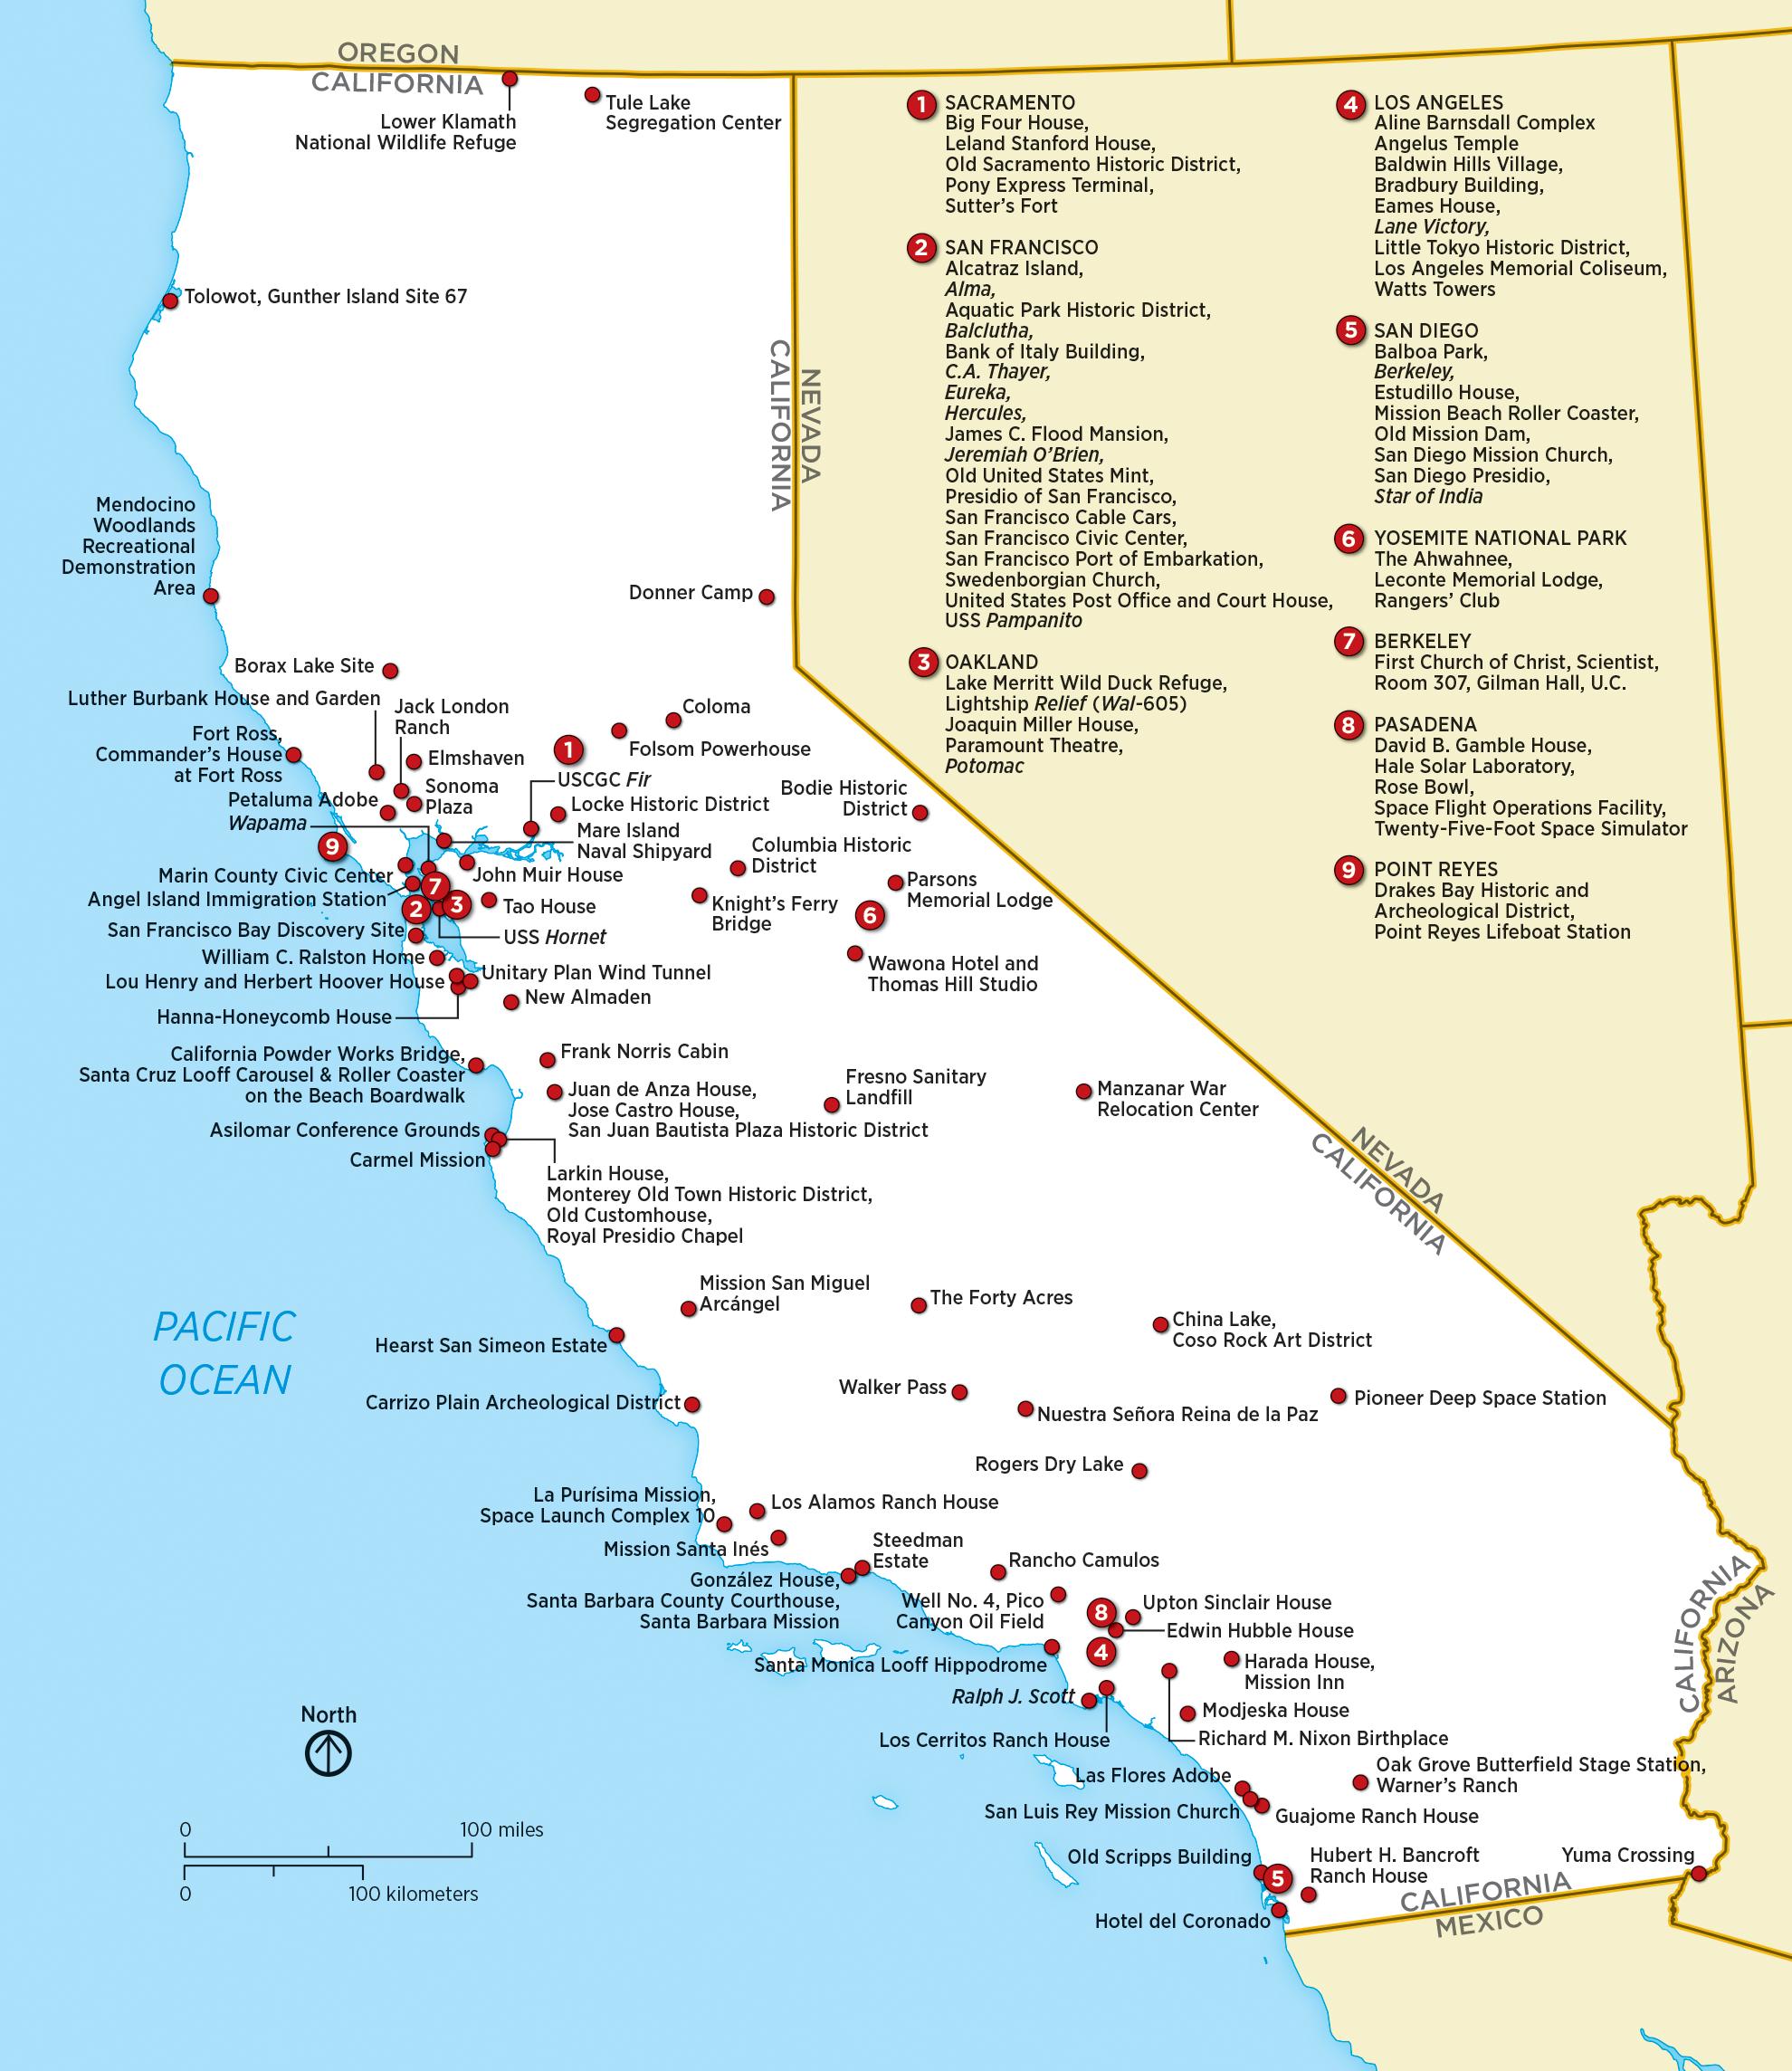 List Of National Historic Landmarks In California - Wikipedia - Map Of California National Parks And Monuments